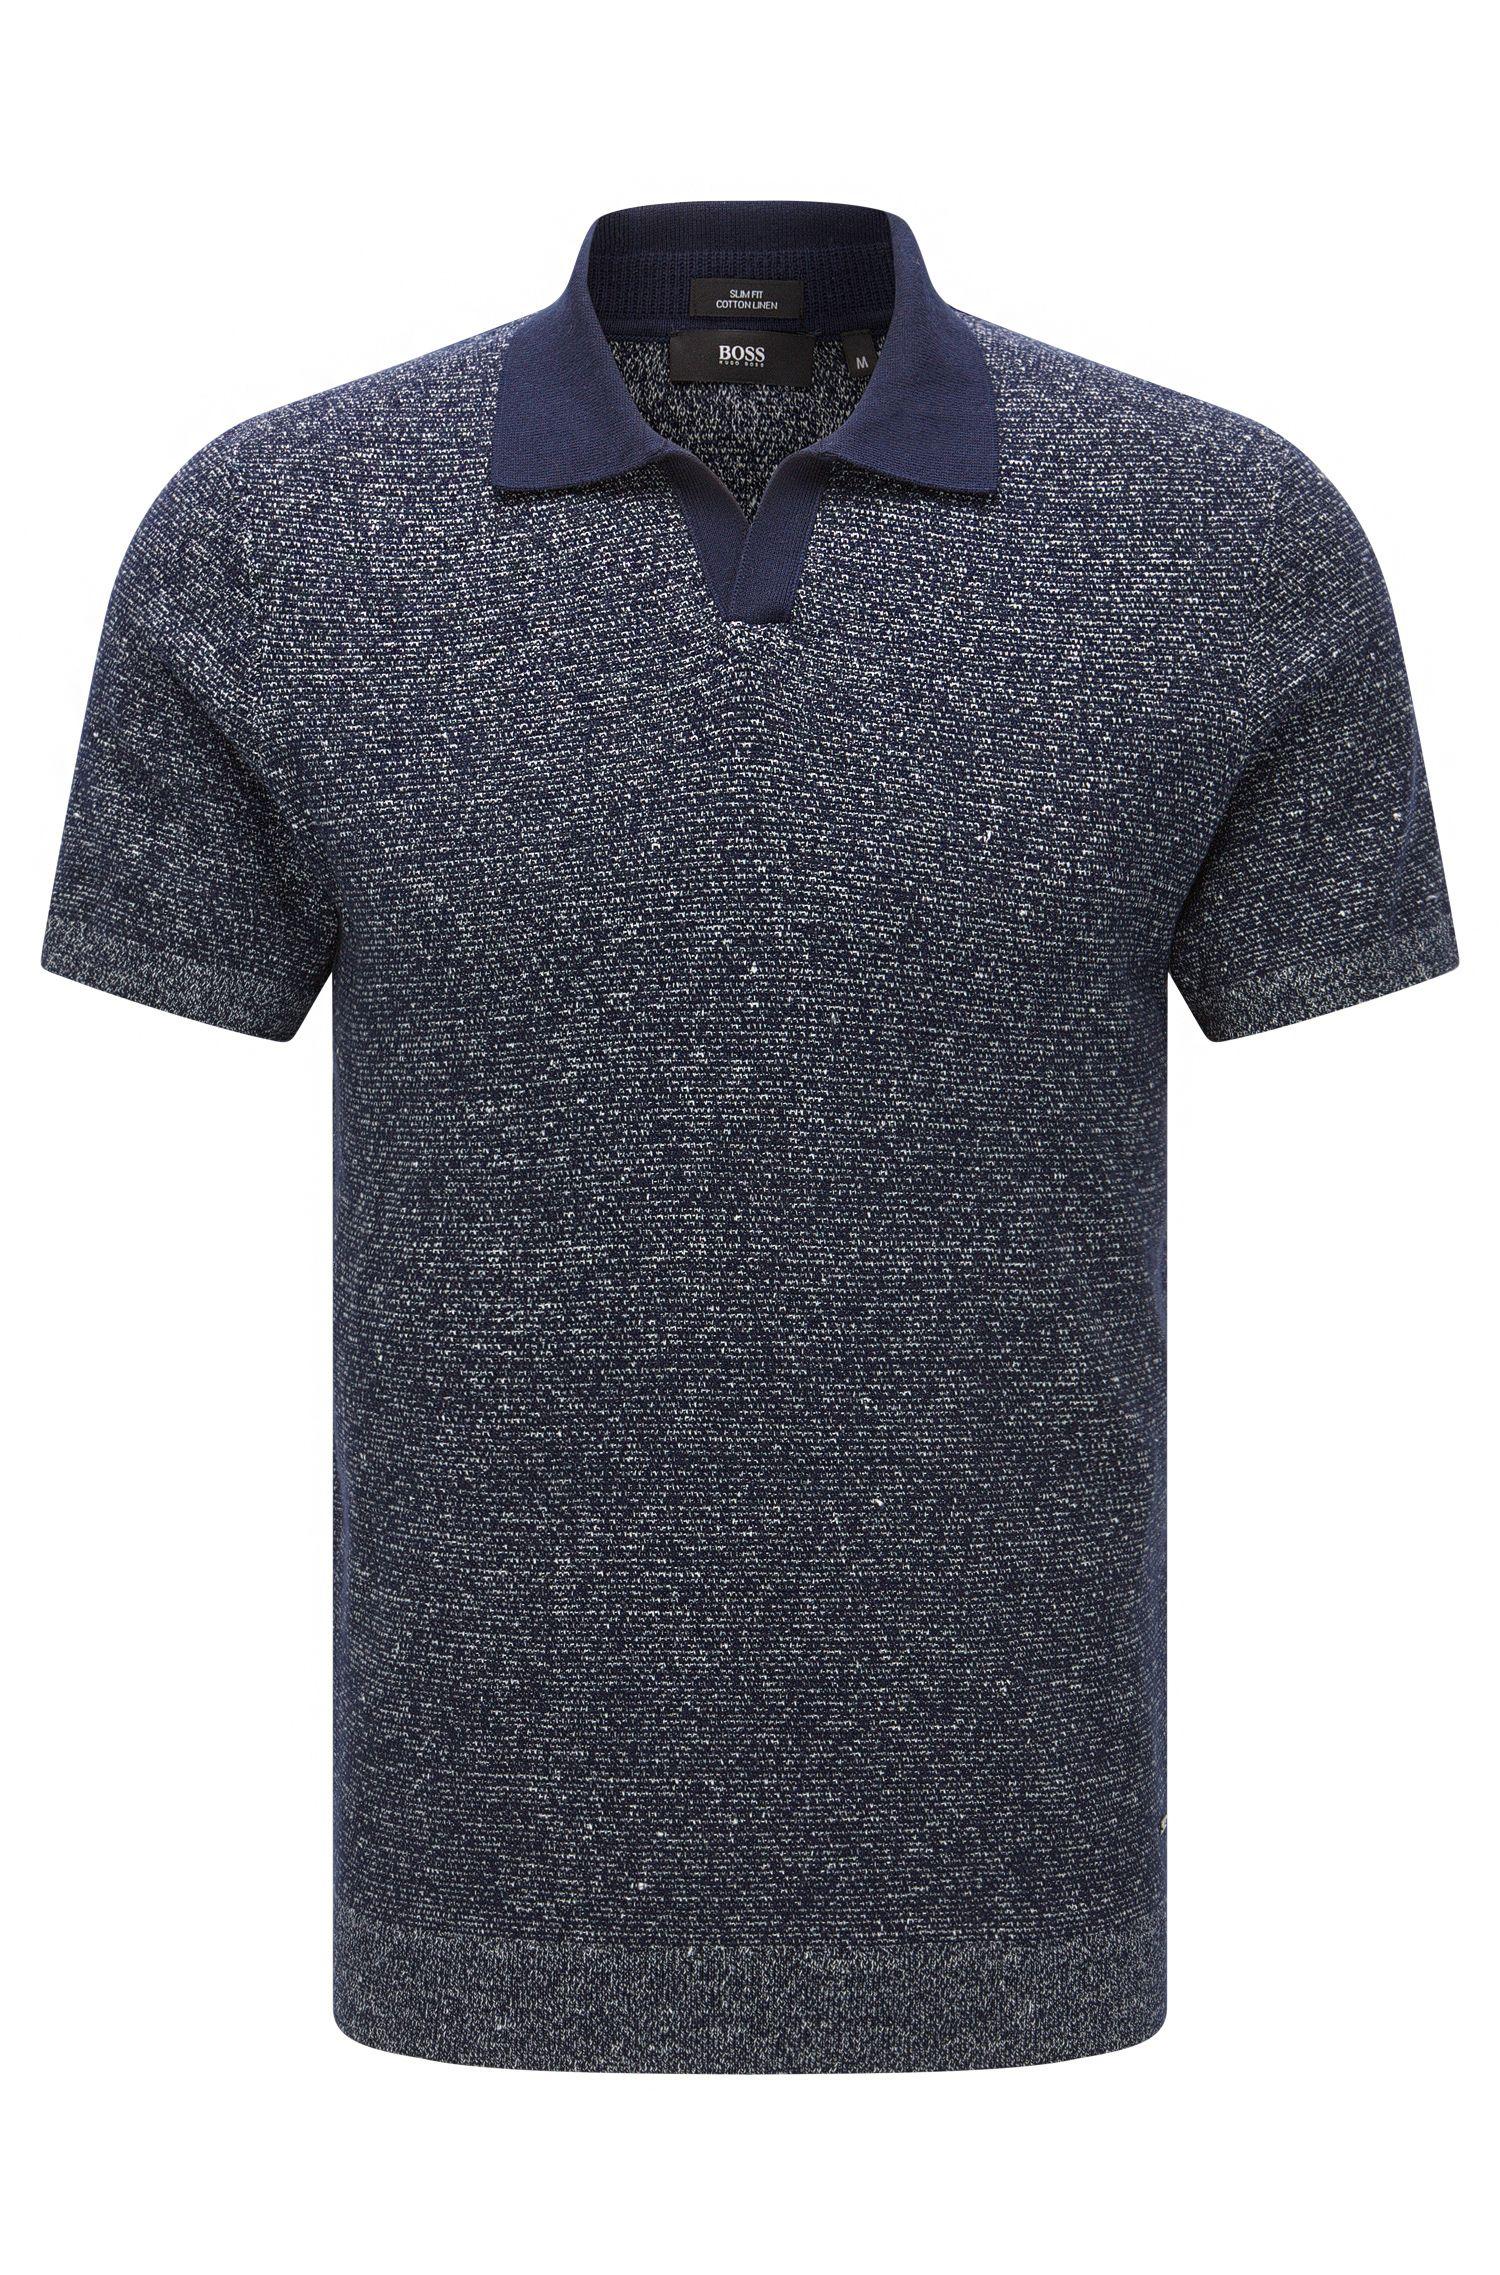 'Orenzo' | Slim Fit, Cotton Linen Sweater